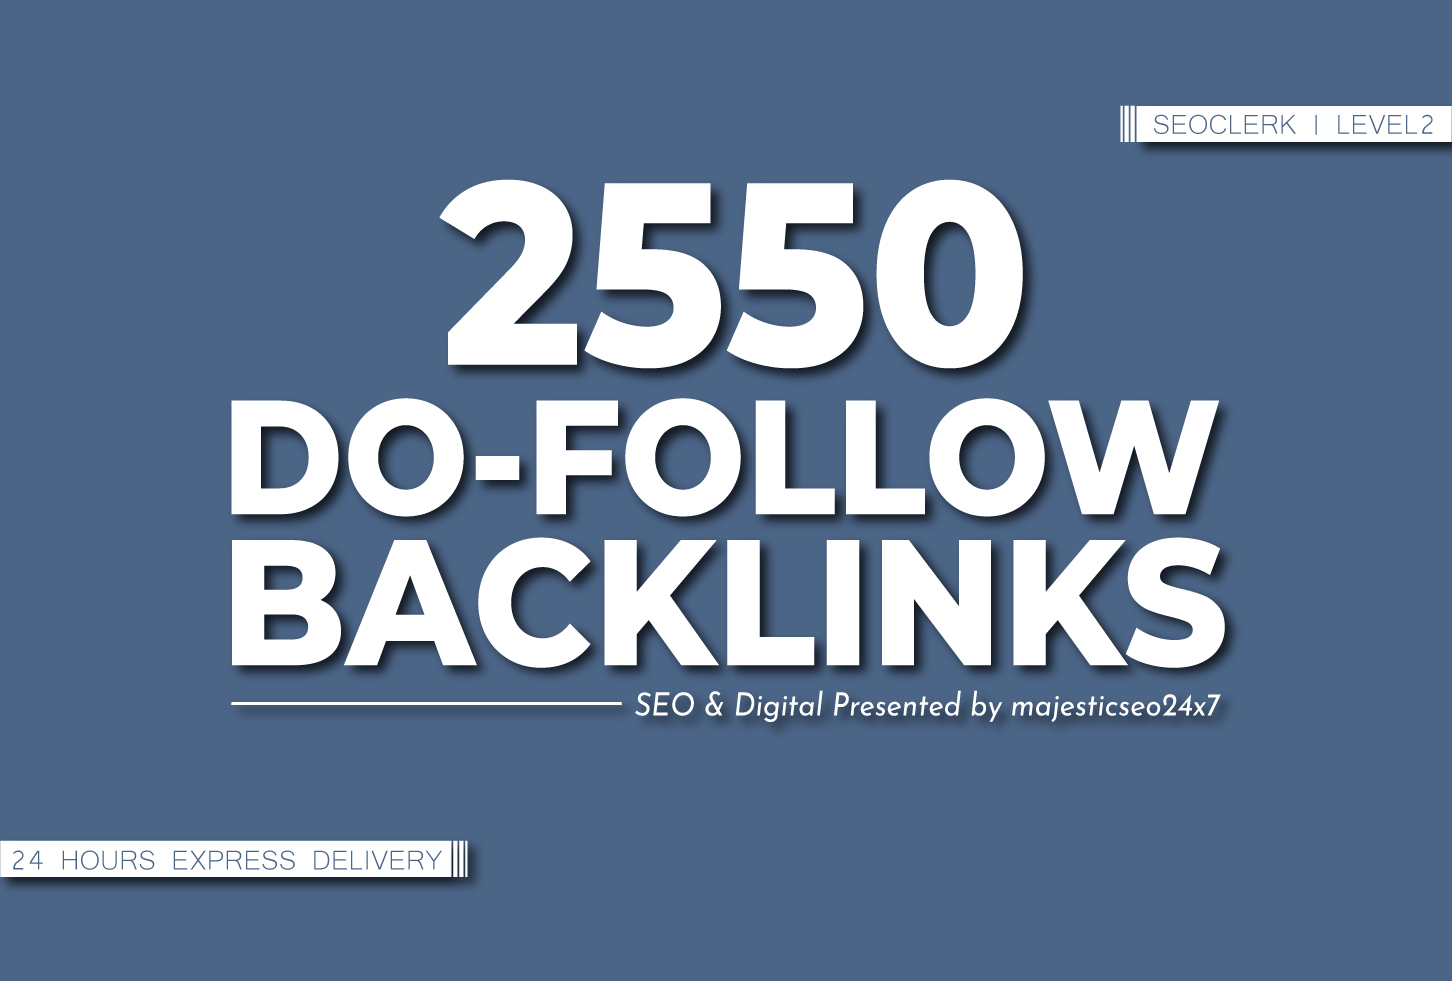 2550 Do follow Blogs Post Backlinks high PR-1 - PR-9 And DA 80+ / Blast Your SEO Ranking